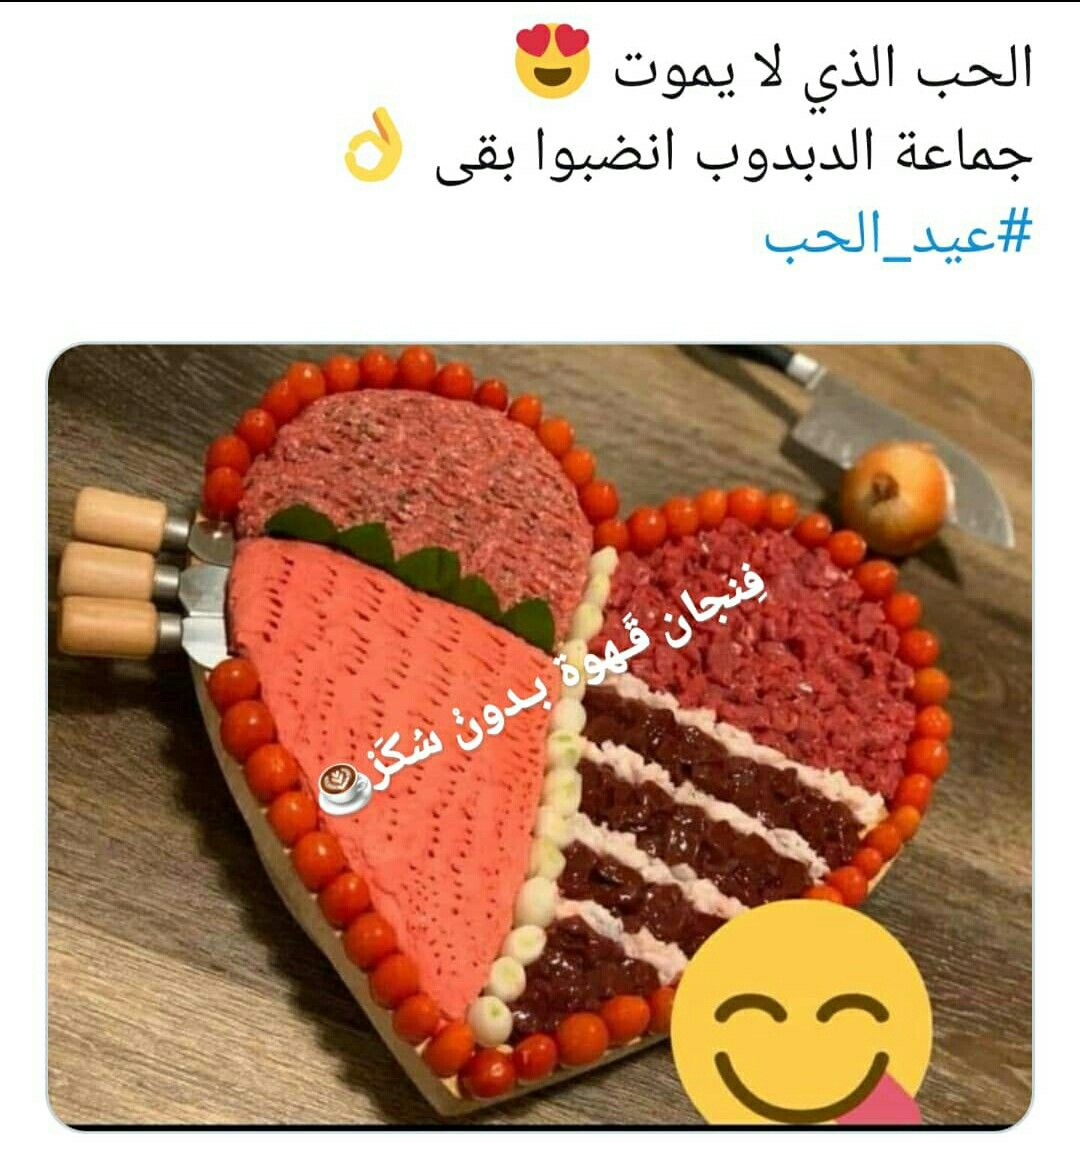 Eman Alhelou Adli Kullanicinin عيد الحب Valentine Day Panosundaki Pin